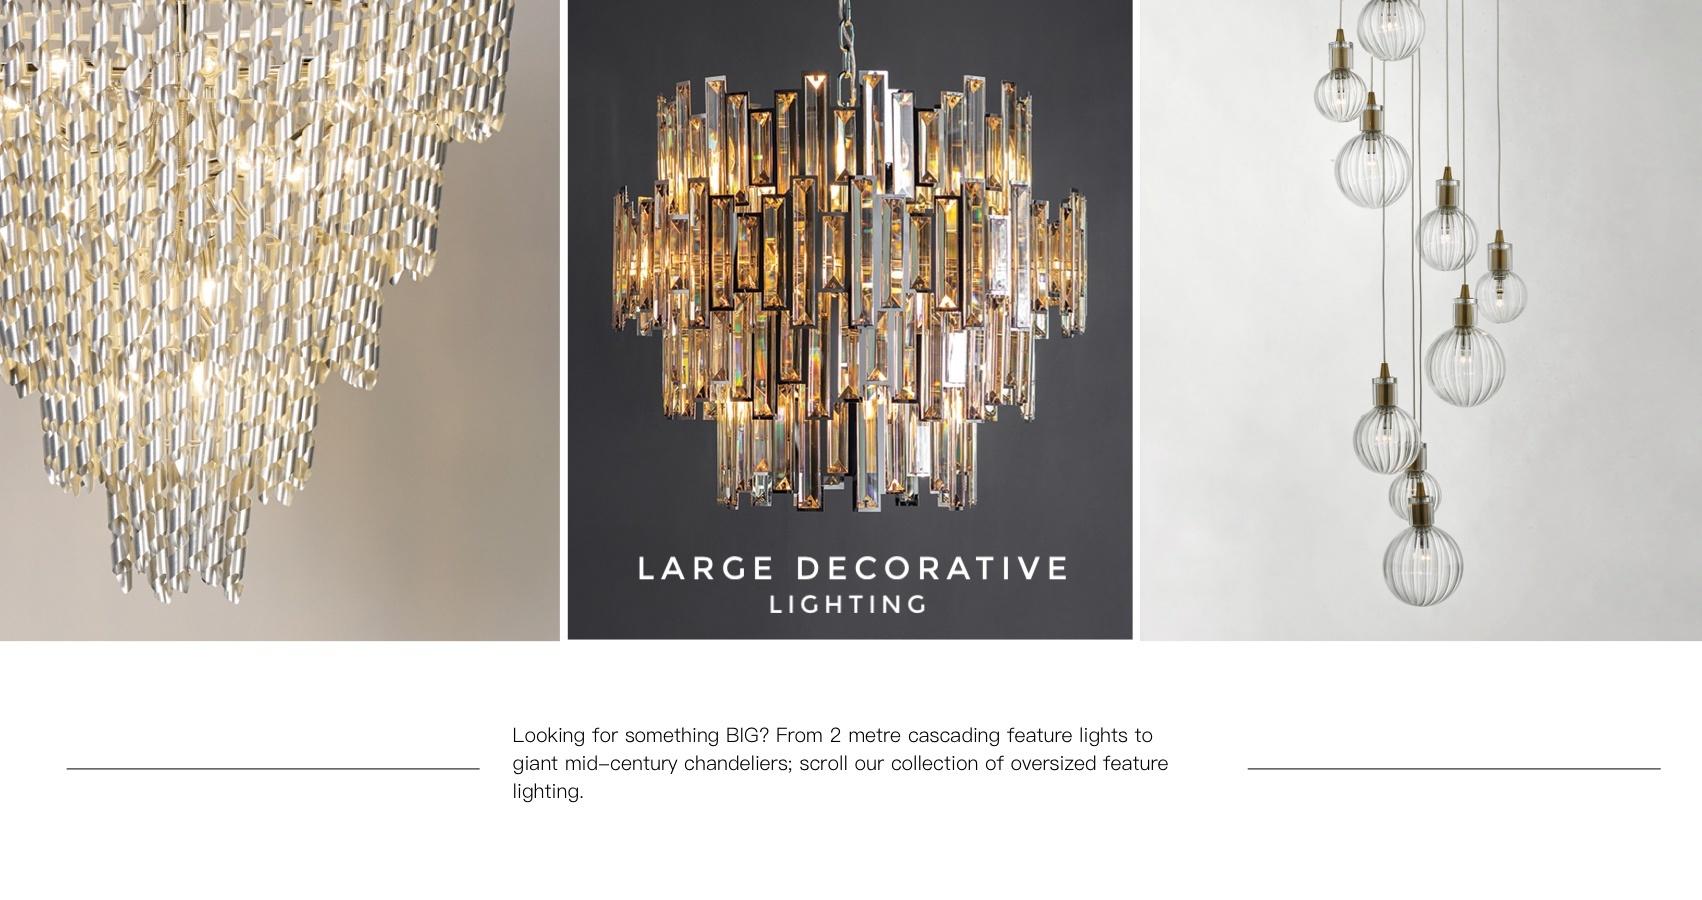 Large Decorative Lighting